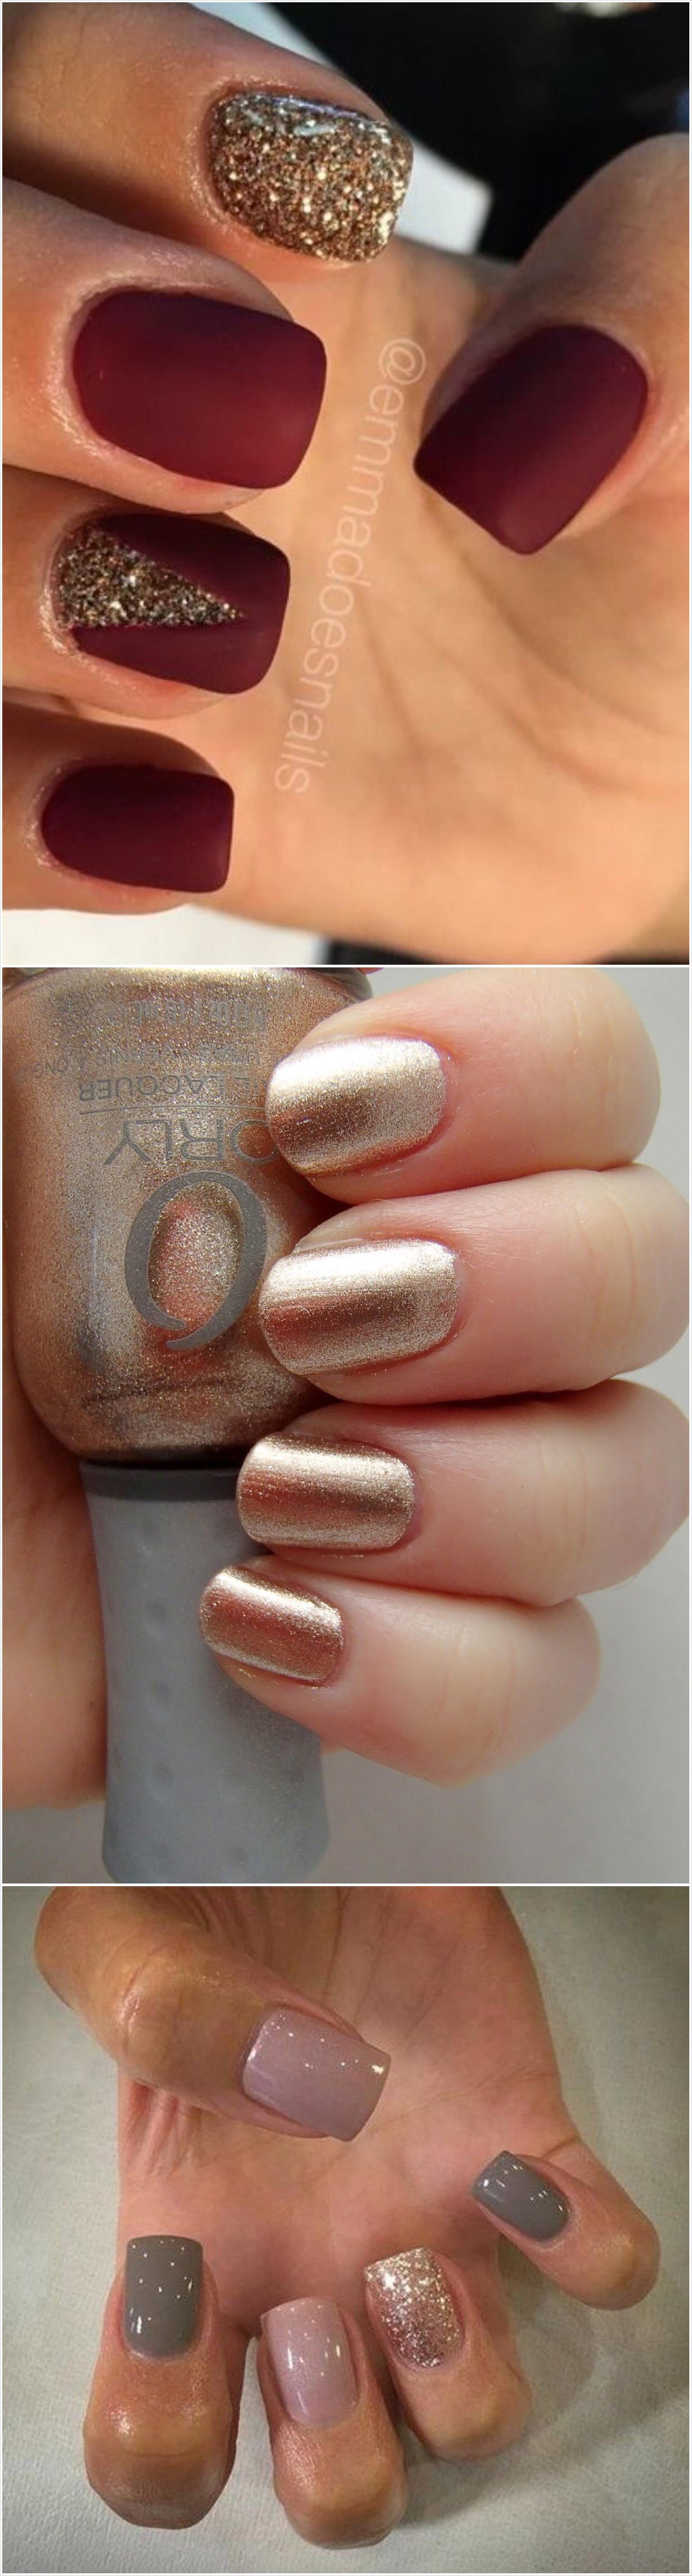 trending nail art ideas beauty nails